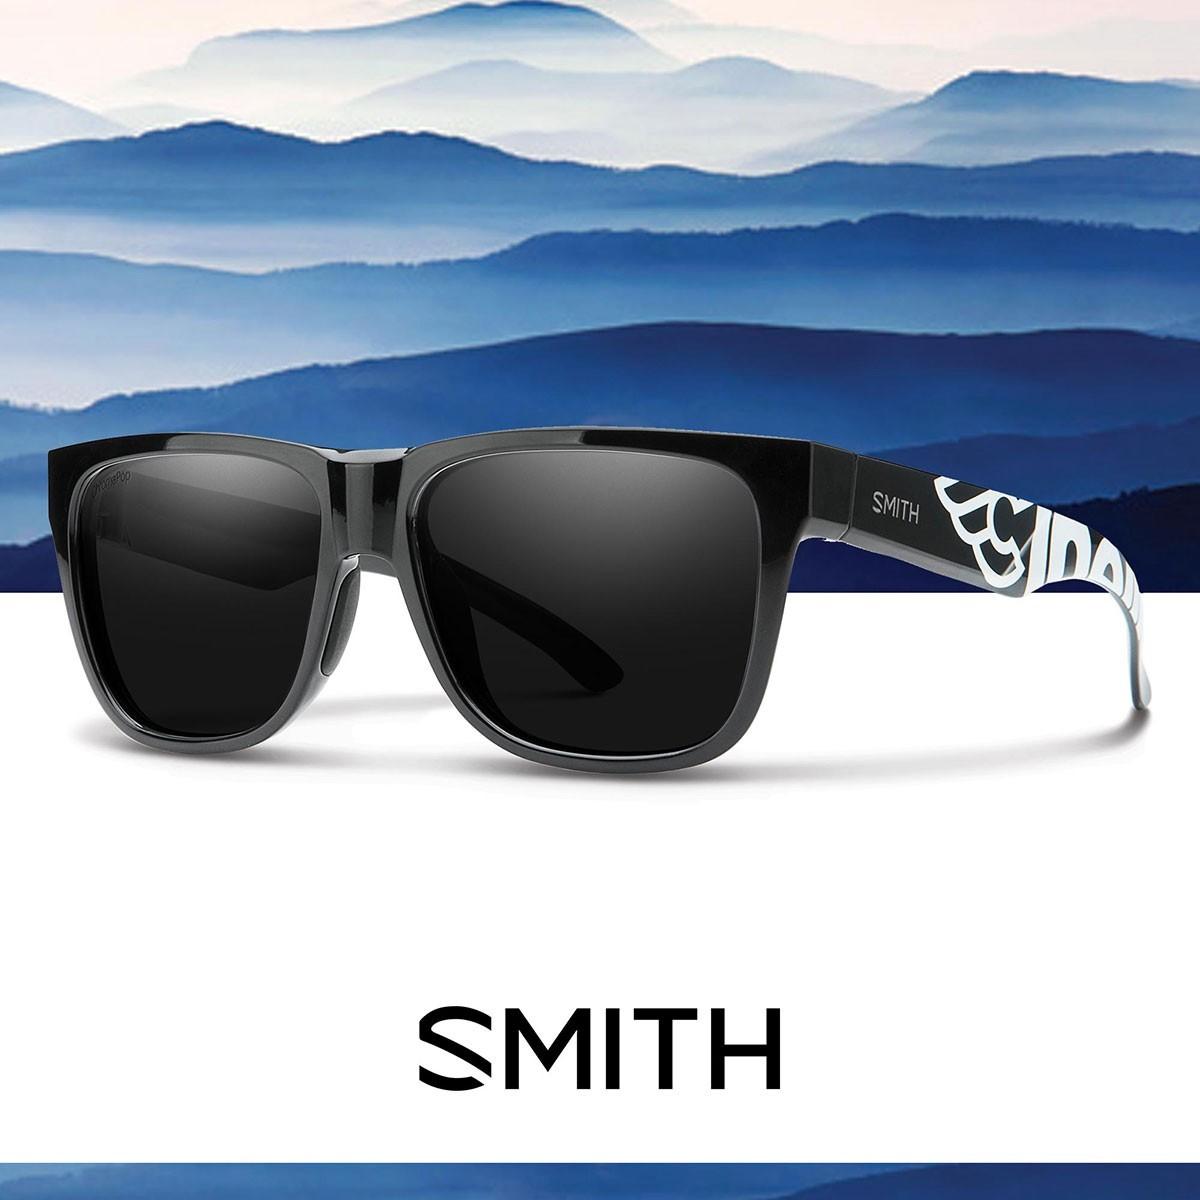 SMITH LOWDOWN 2 Cinelli CHROMAPOP - Изображение - AQUAMATRIX